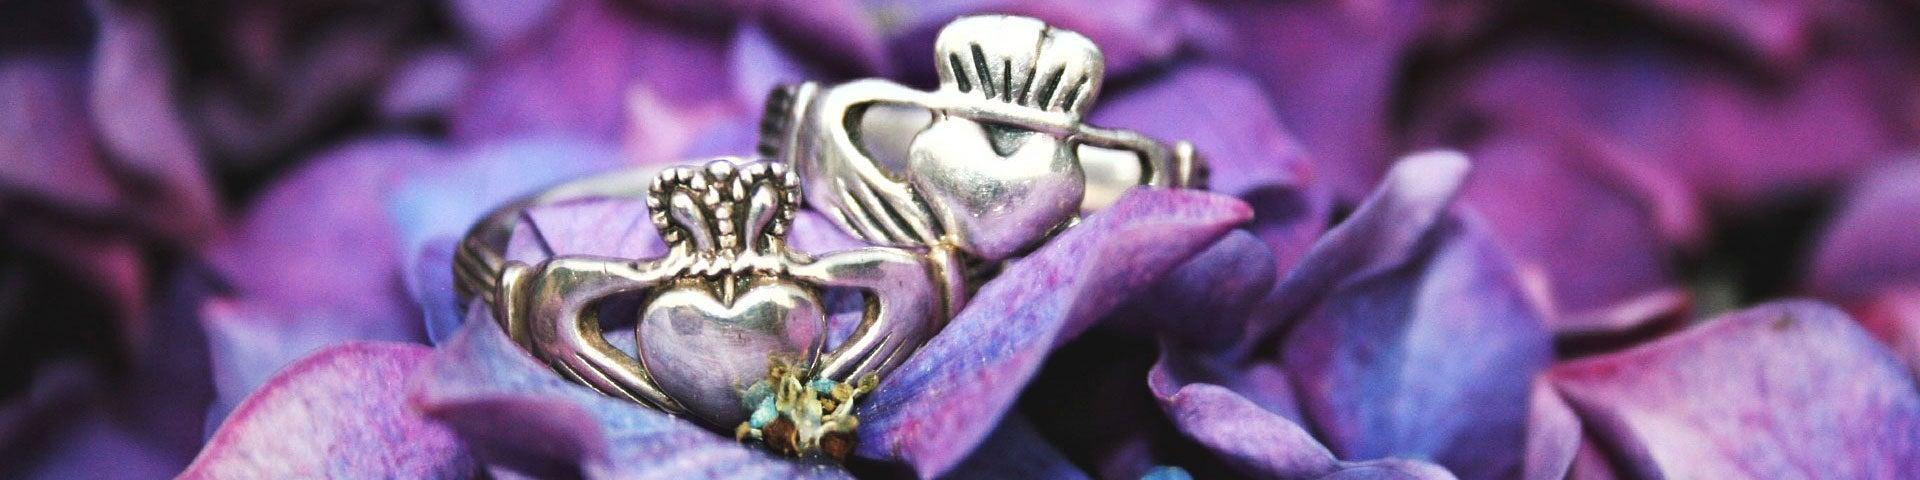 Two Claddagh rings on purple hydrangeas